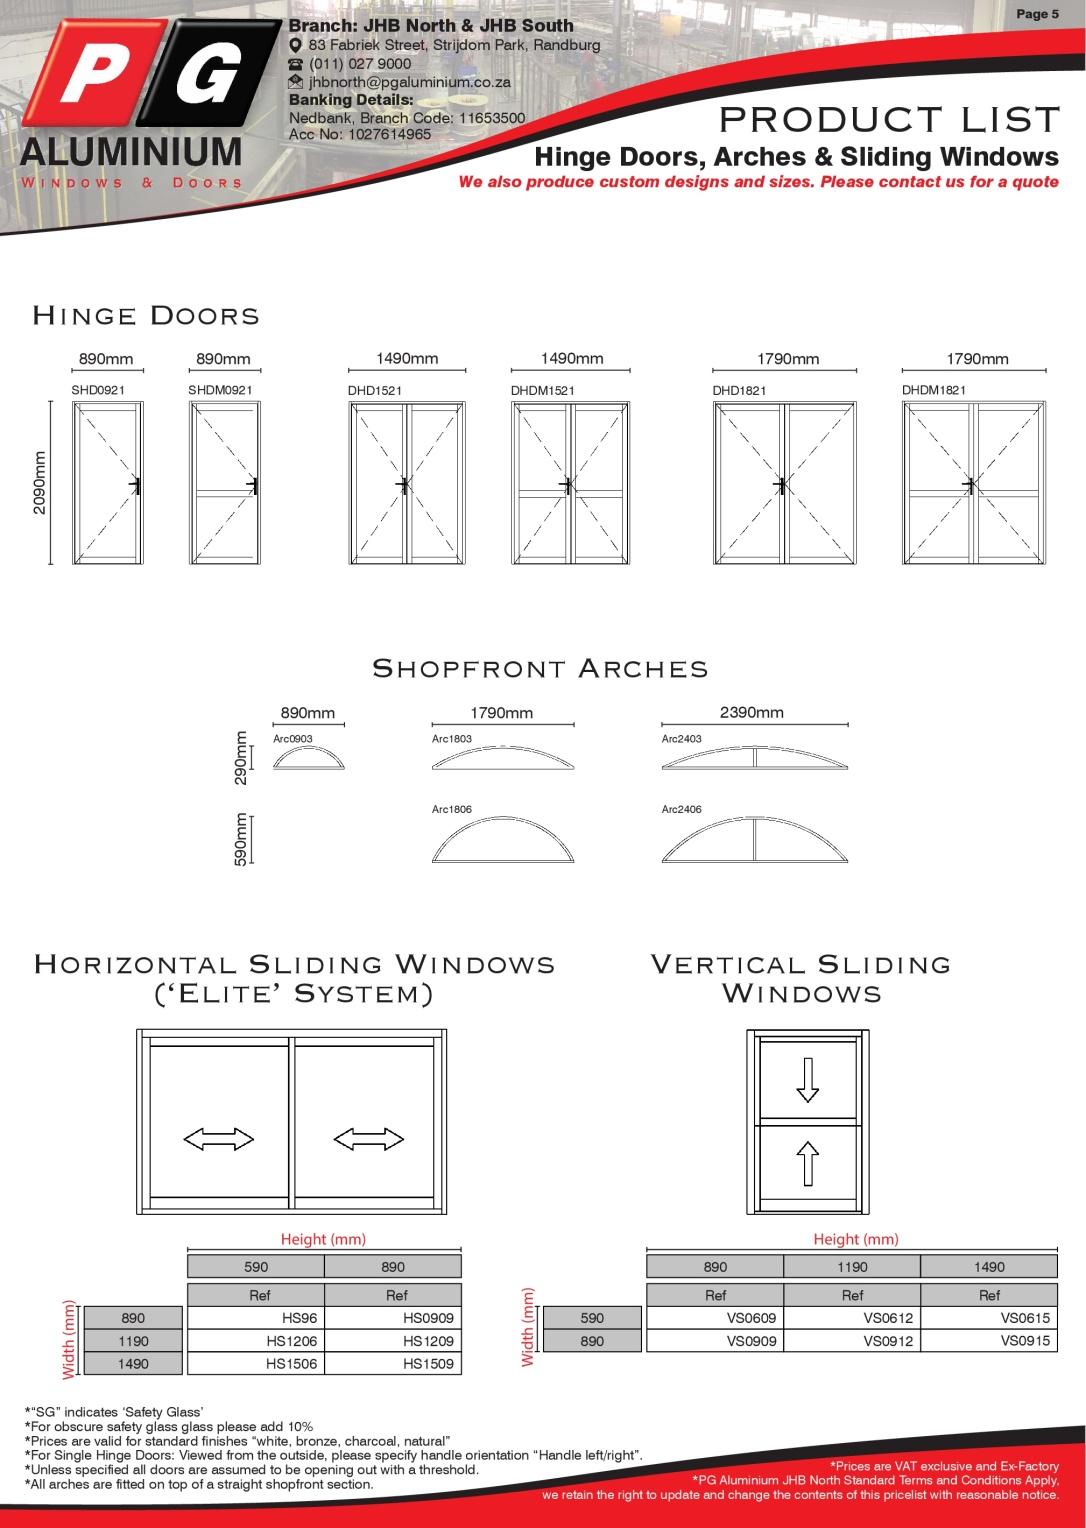 PGAJHBN - Std Product List Page 5 -HingeDoors,Arches,Sliding Windows